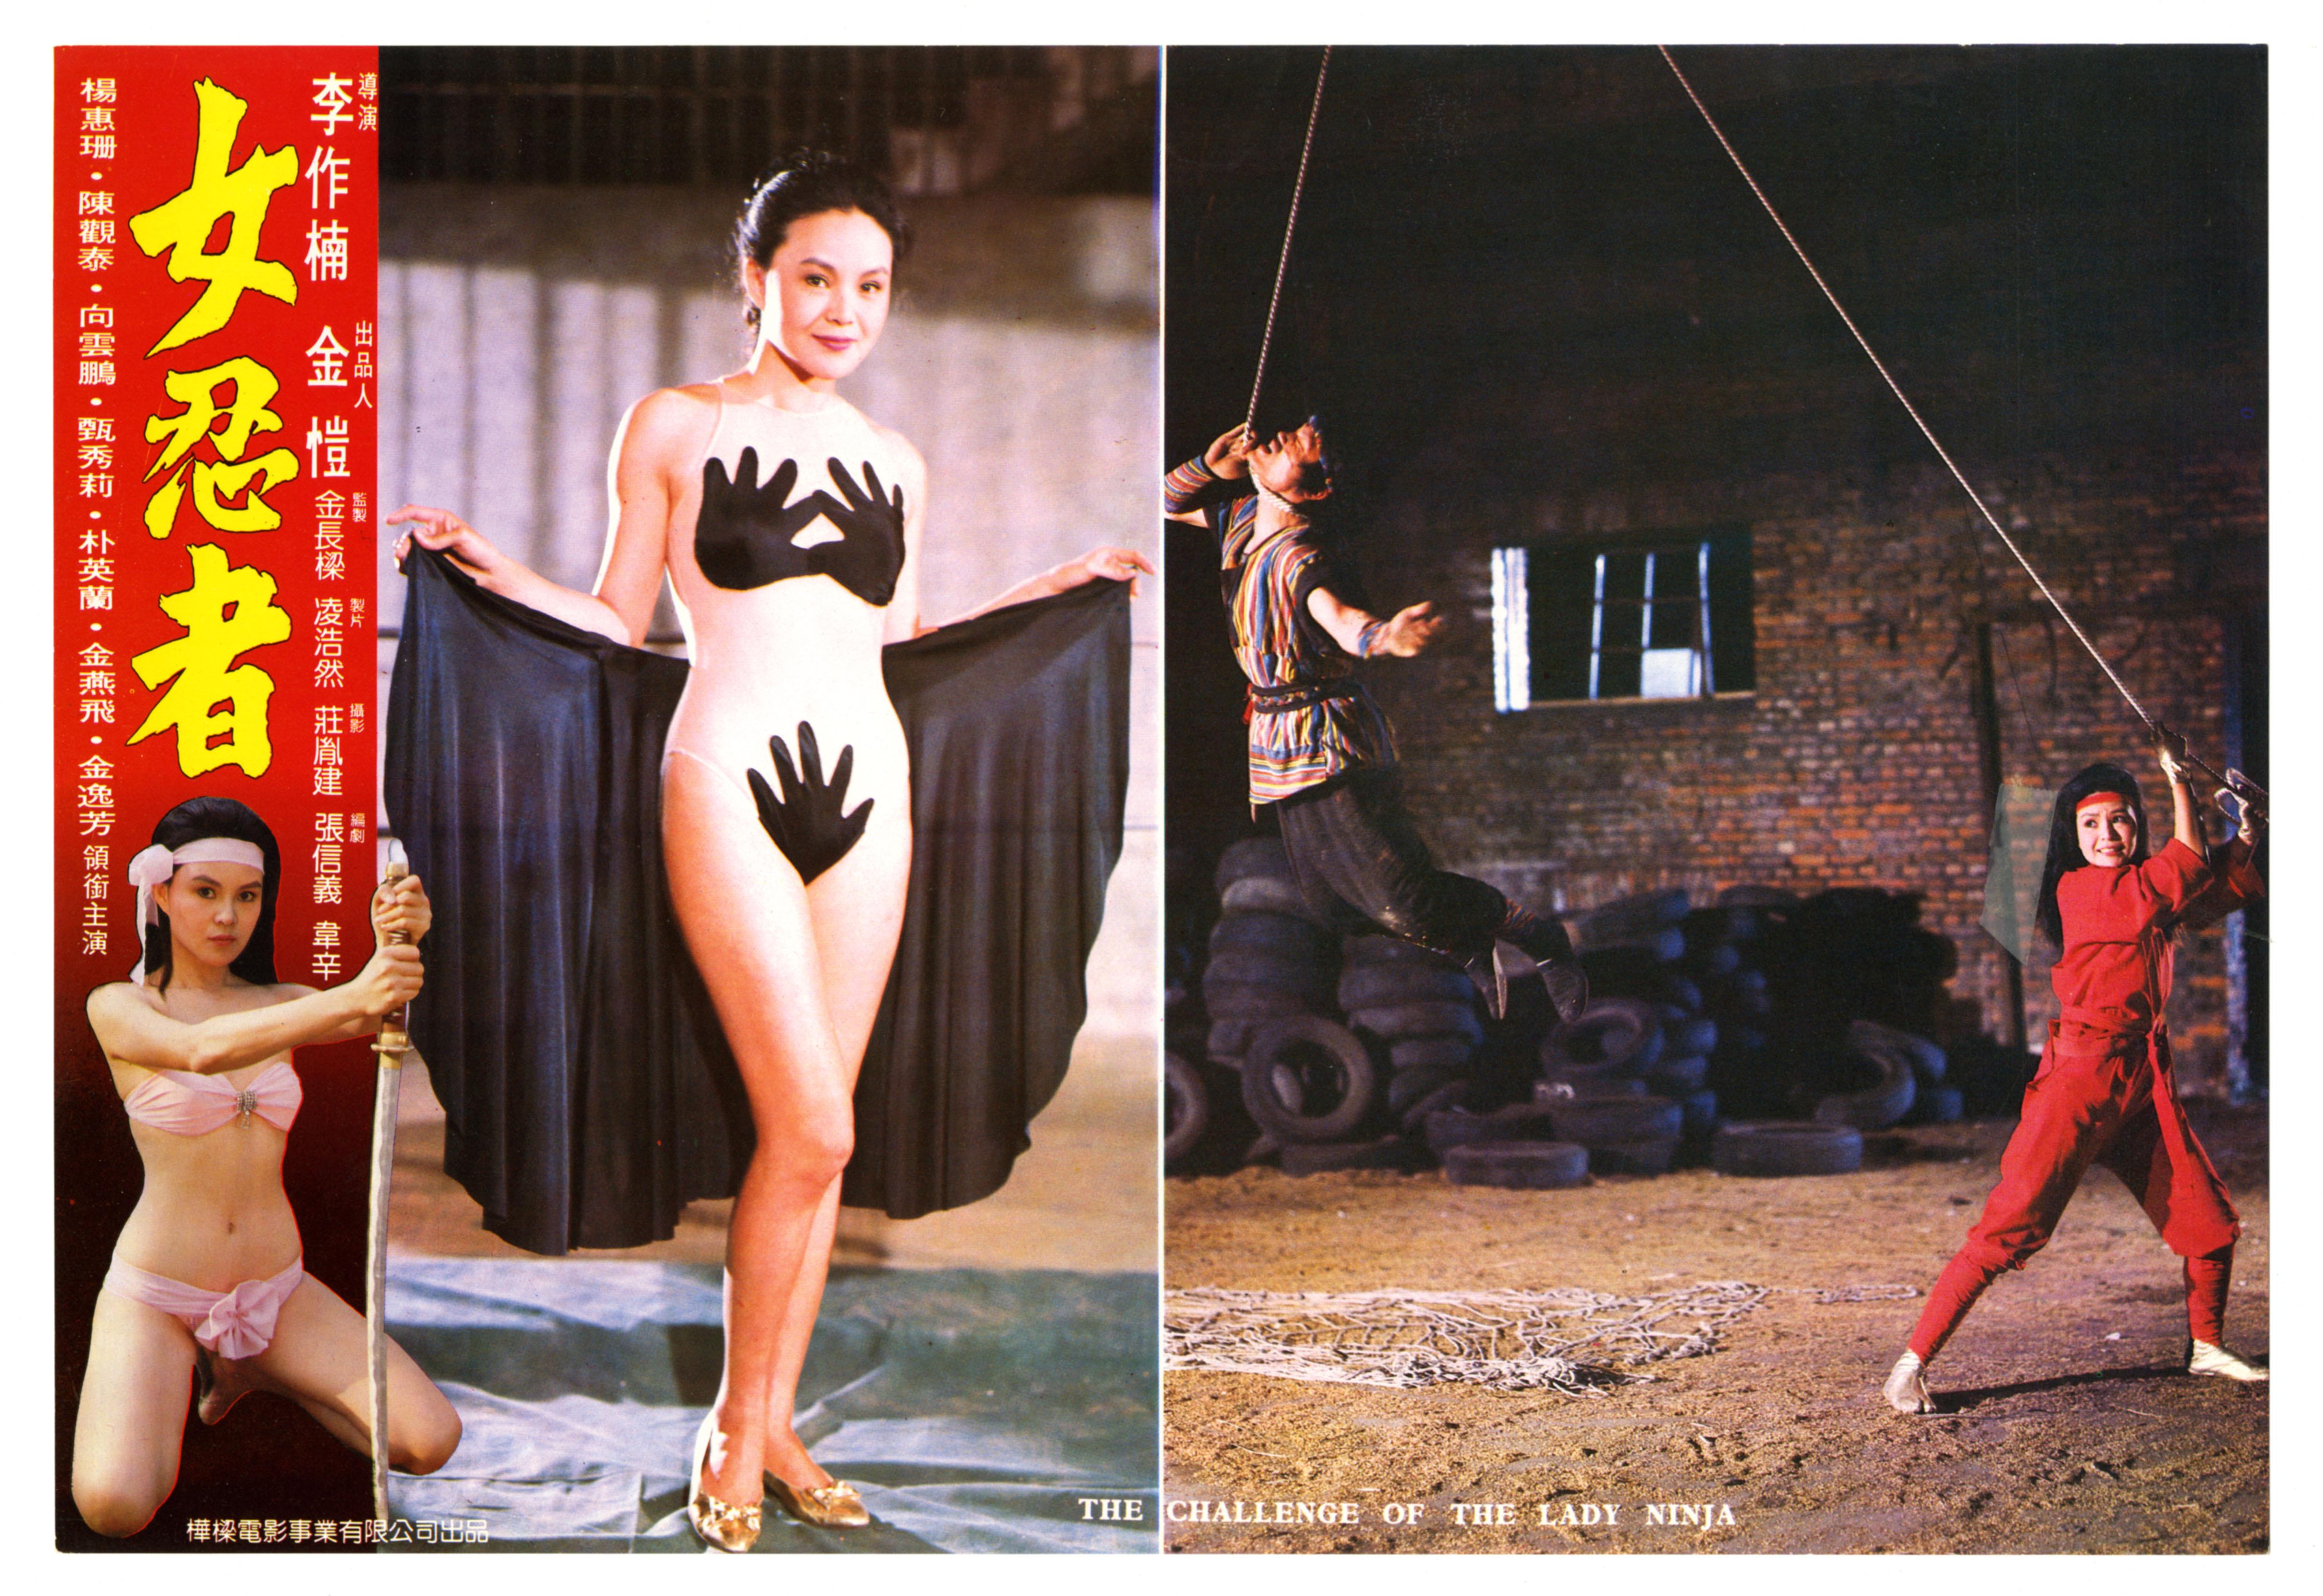 The Challenge of the Lady Ninja_Still 1.jpg